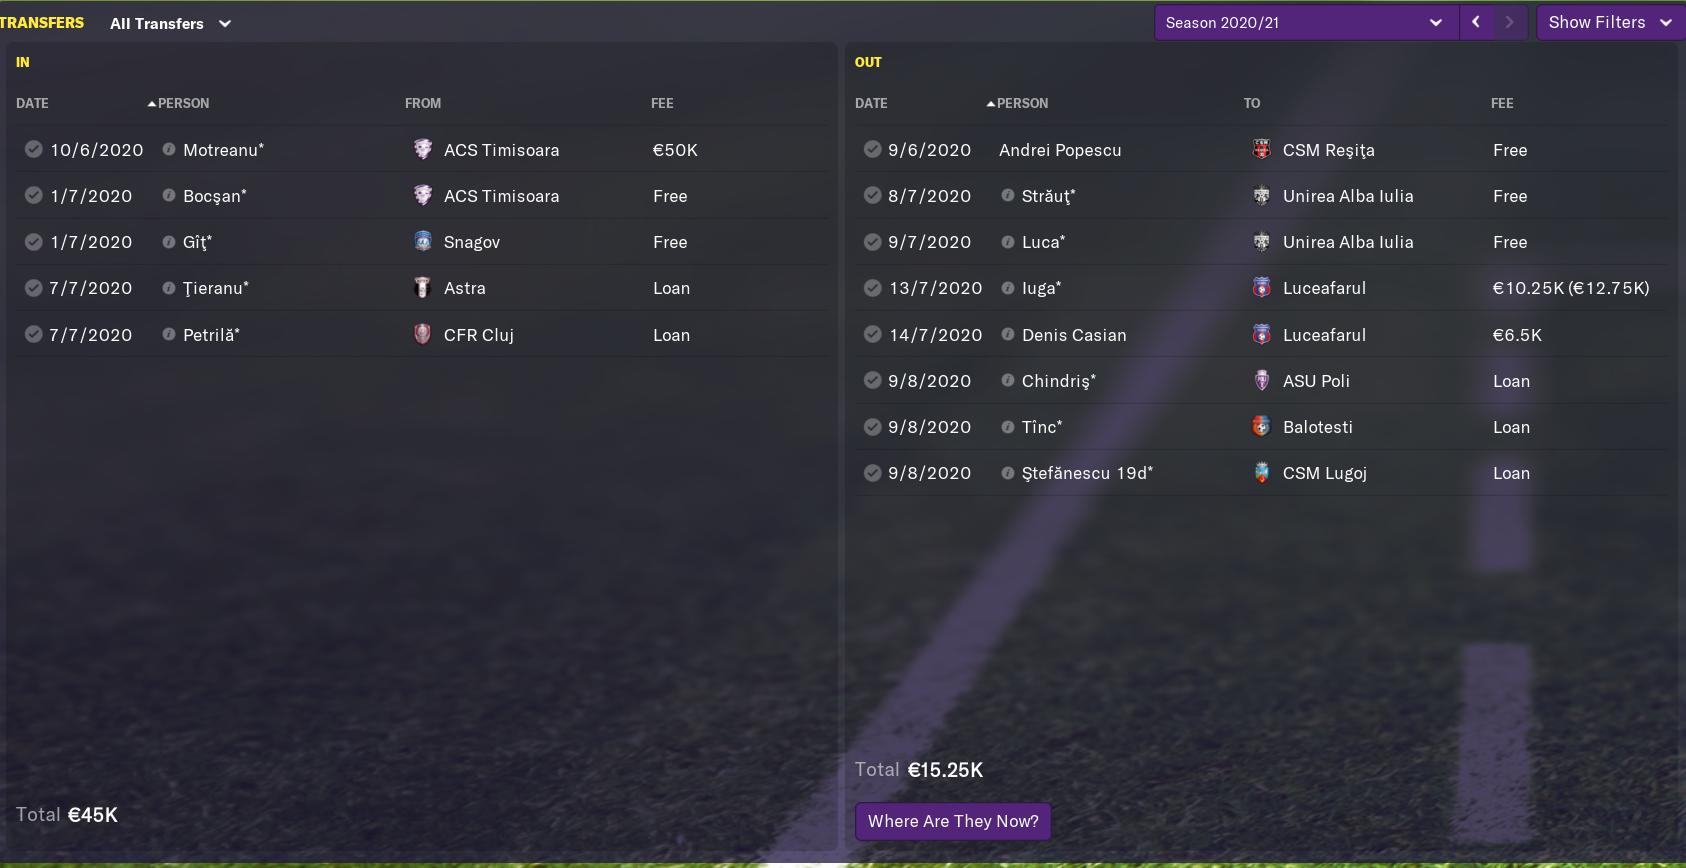 AFC-Ripensia-Timisoara_-Transfer-History34f1c4a9a4918898.png